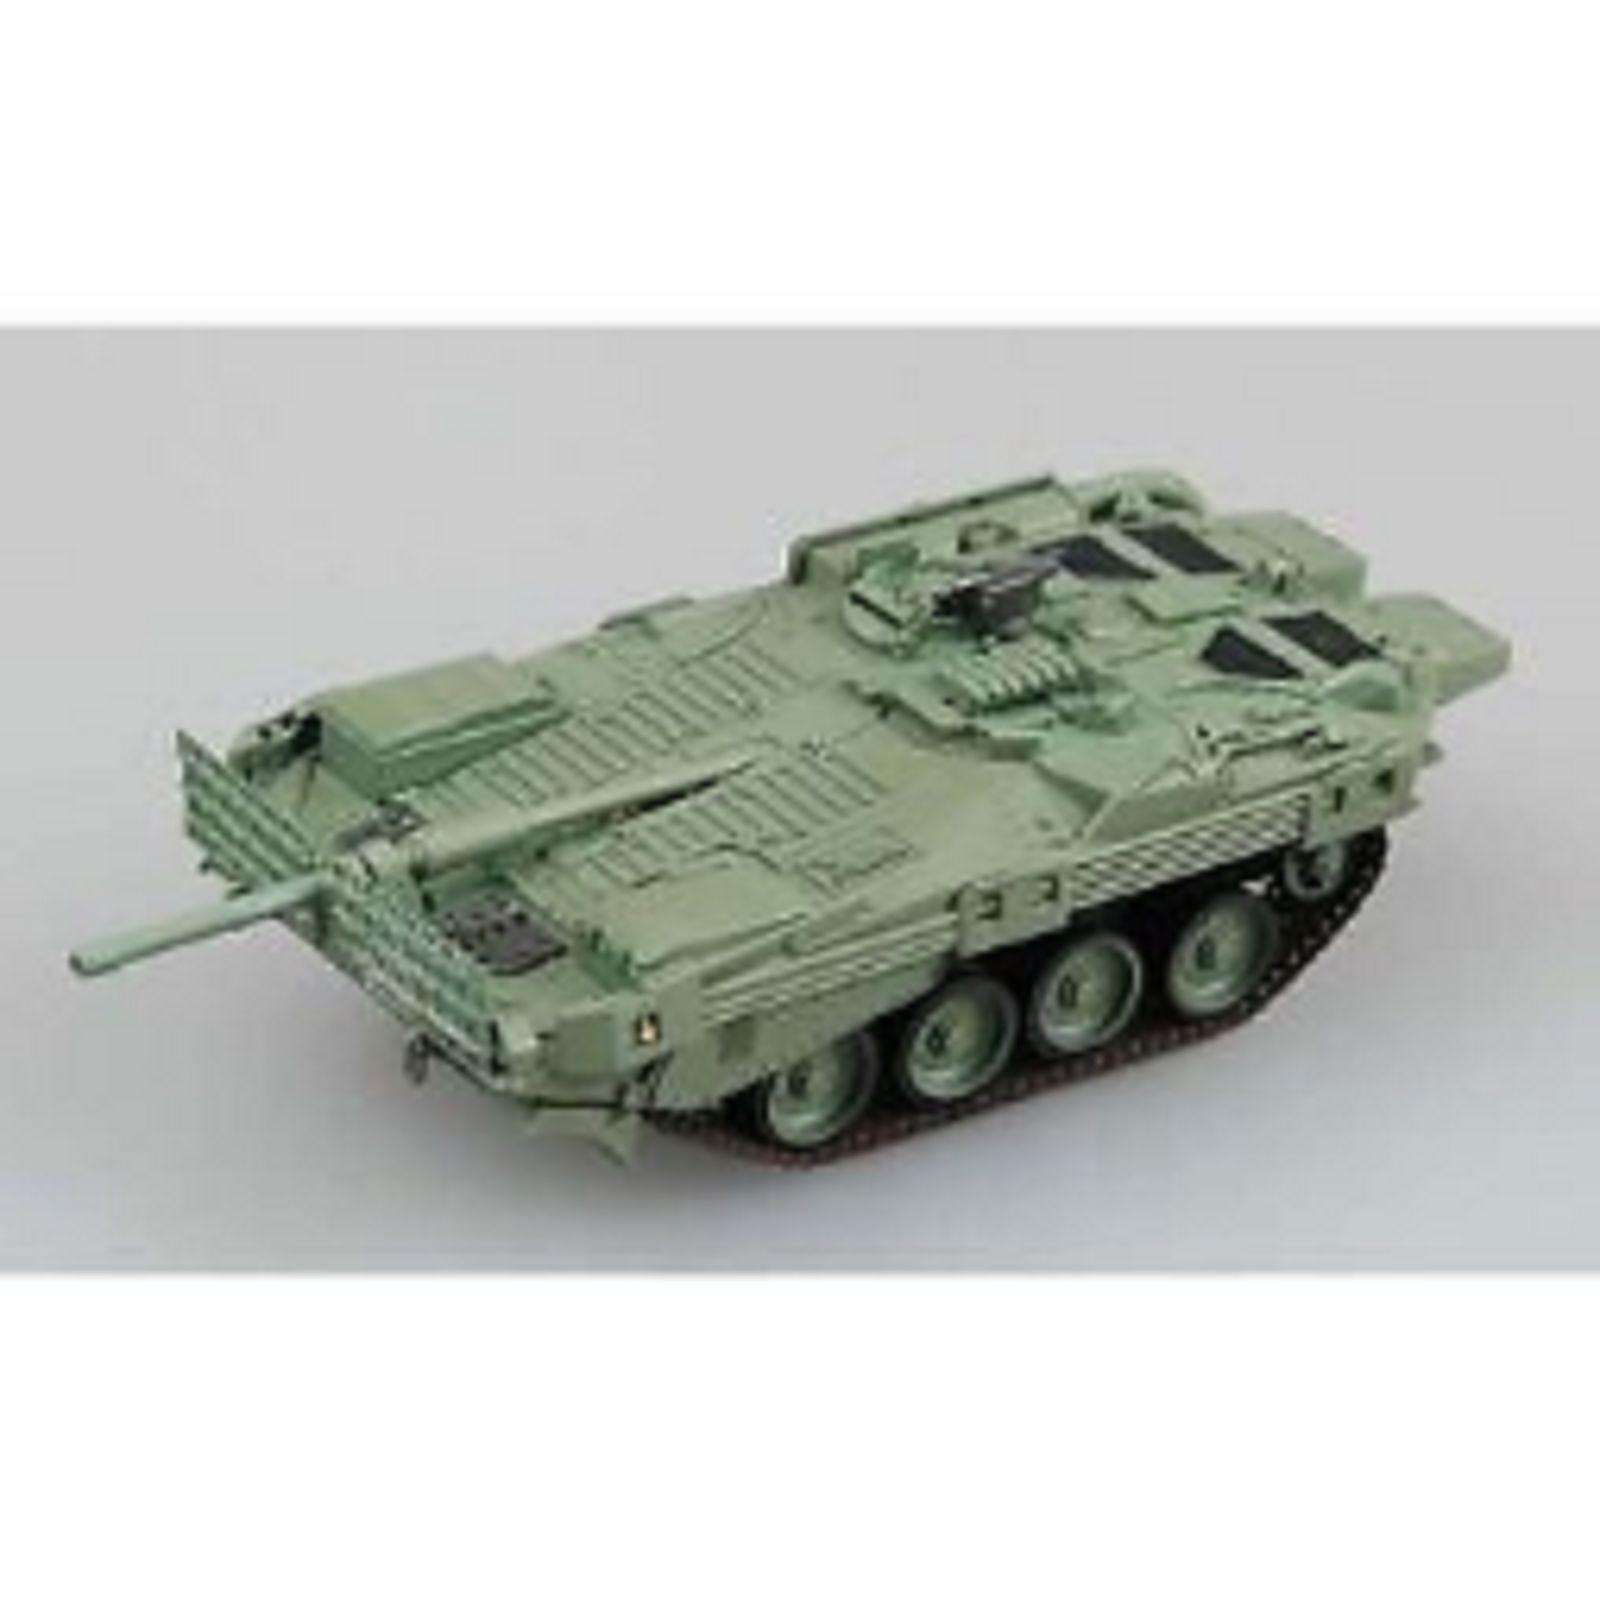 Em35094 Easy Model 1 72 - strv-103 MBT - - - strv-103b Pre CONSTRUIDO Y Pintado cdf0b1